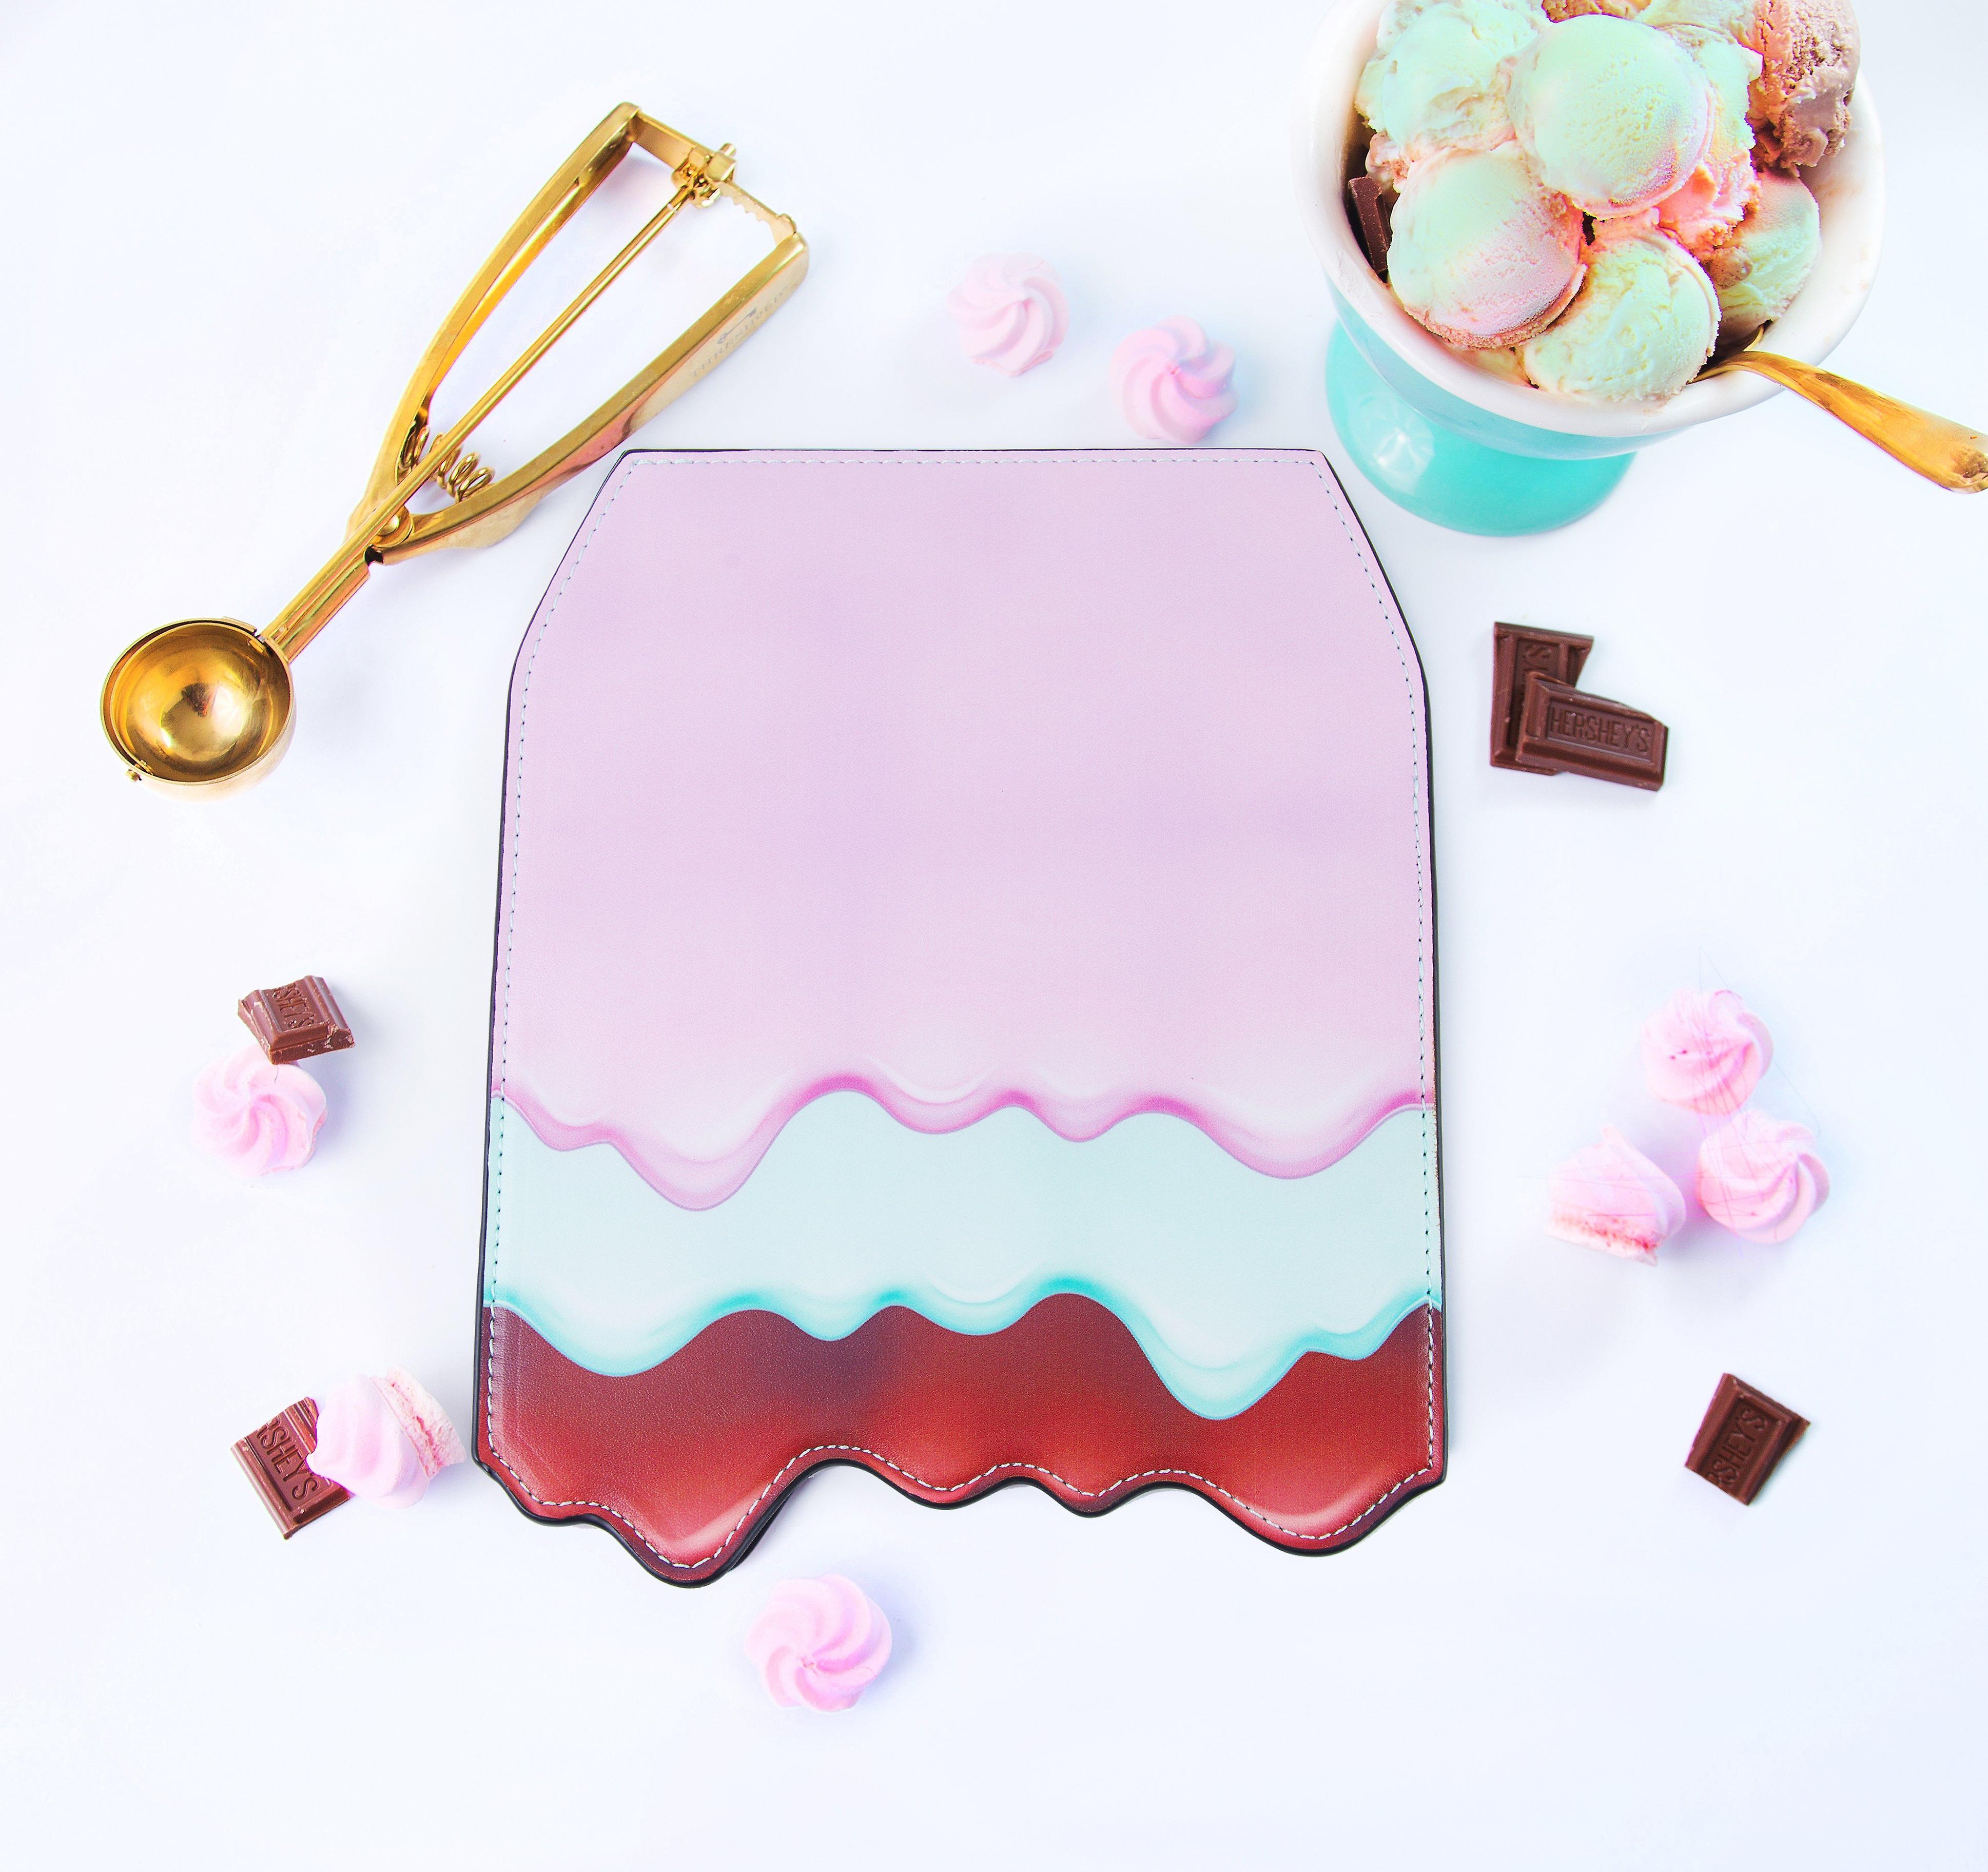 Bake-A-Bag Neapolitan Mint Flap